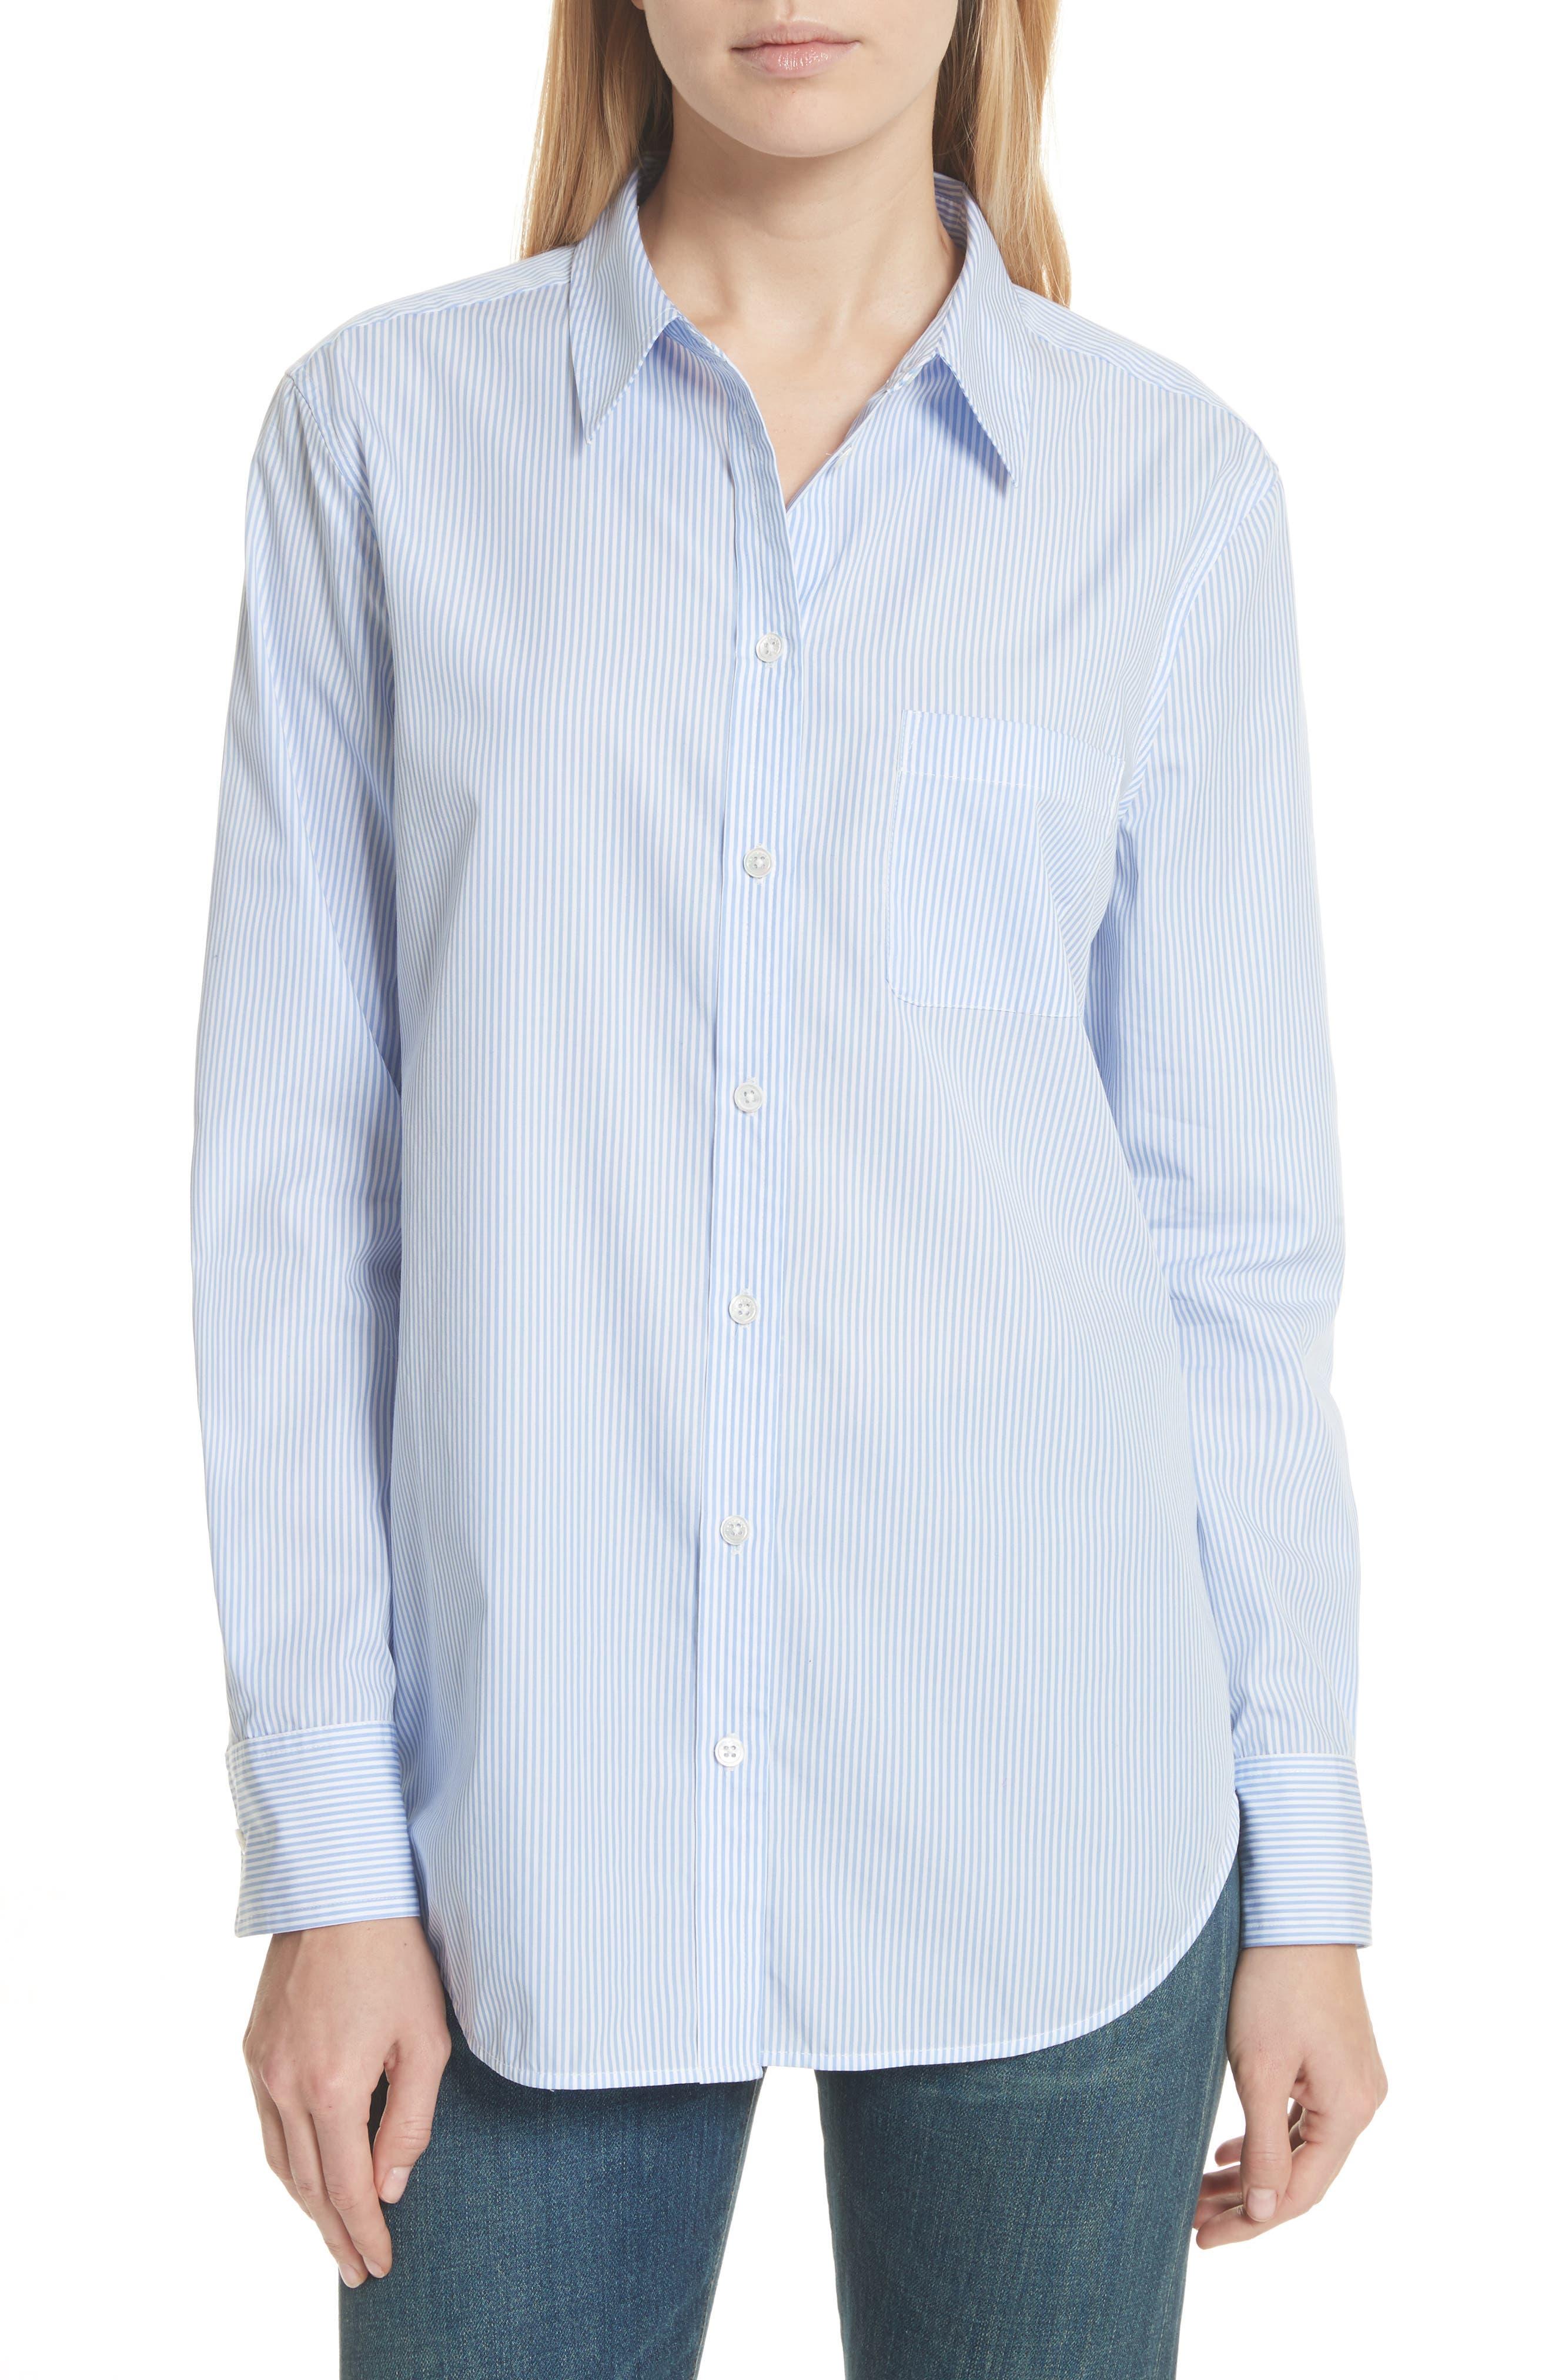 Kenton Stripe Poplin Top,                         Main,                         color, Bright White